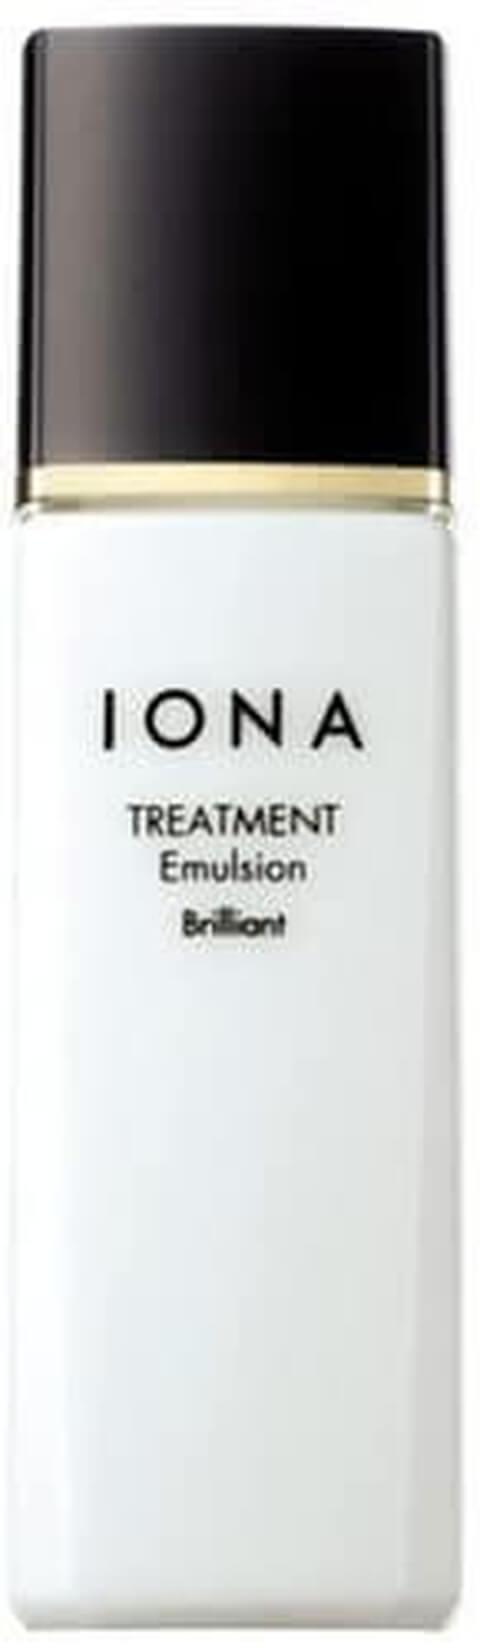 iona-emersion